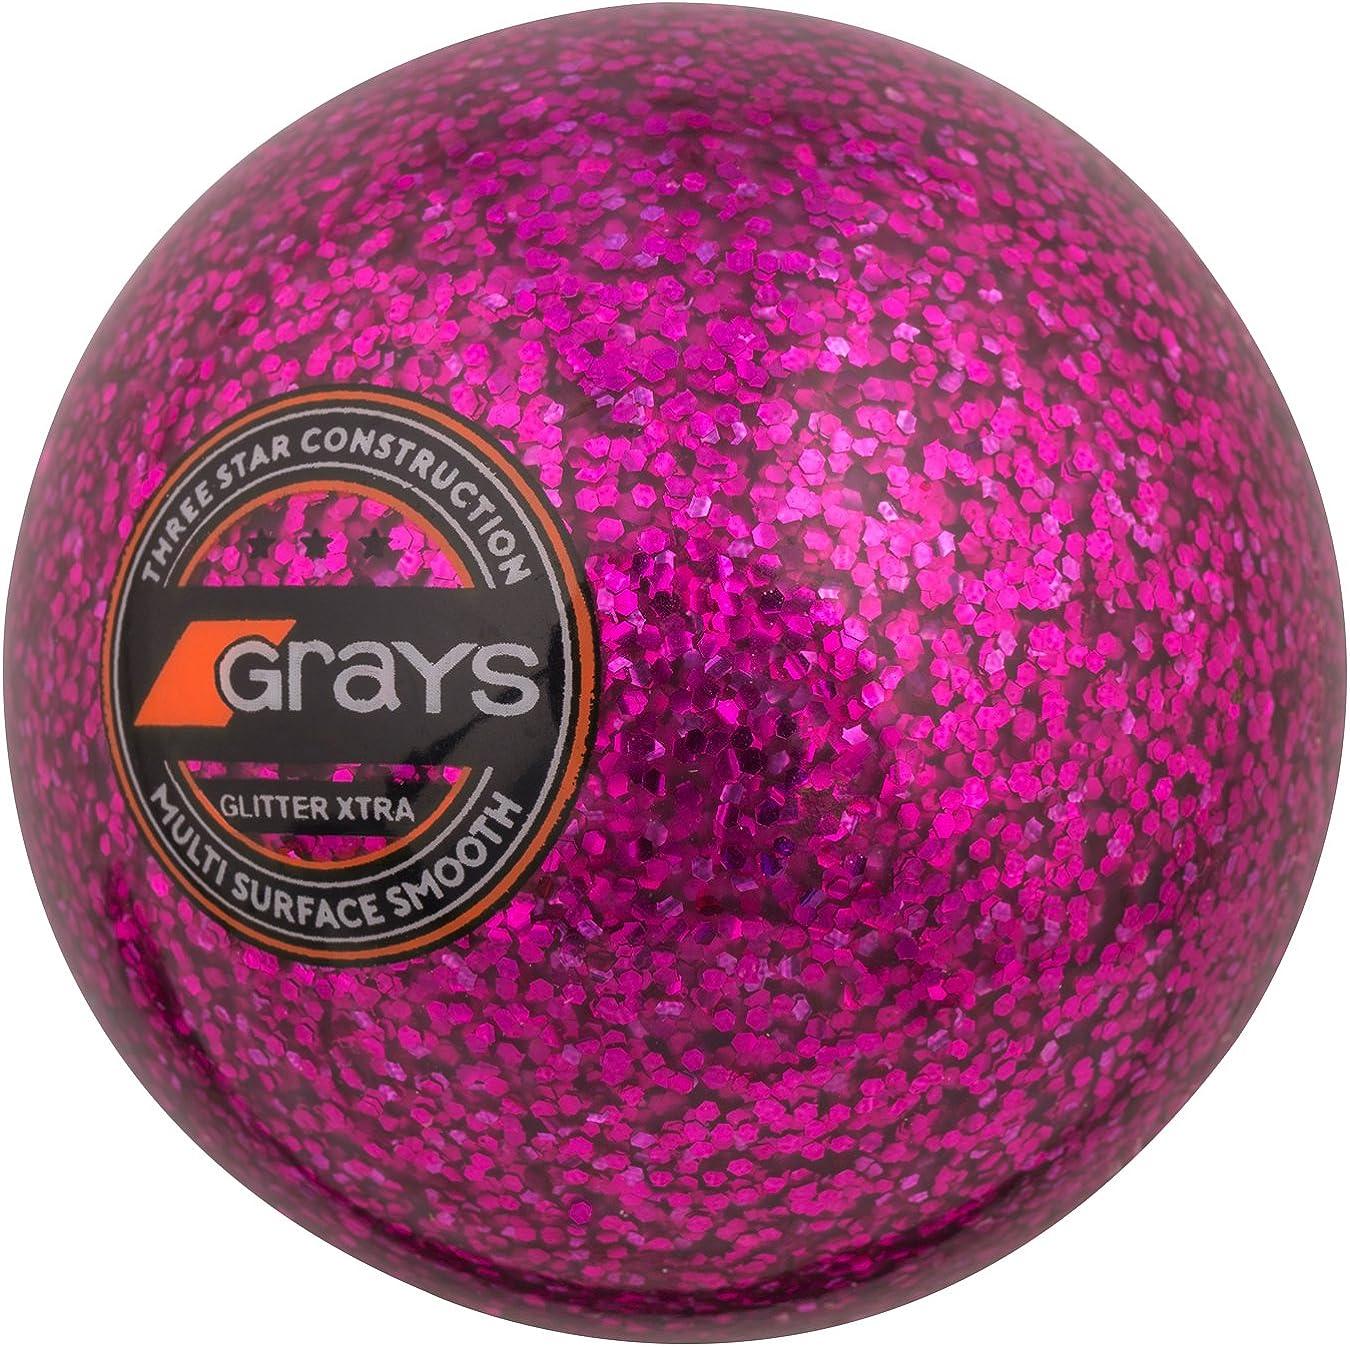 GRAYS New Free Shipping Glitter Xtra Hockey Pink OFFer Ball -